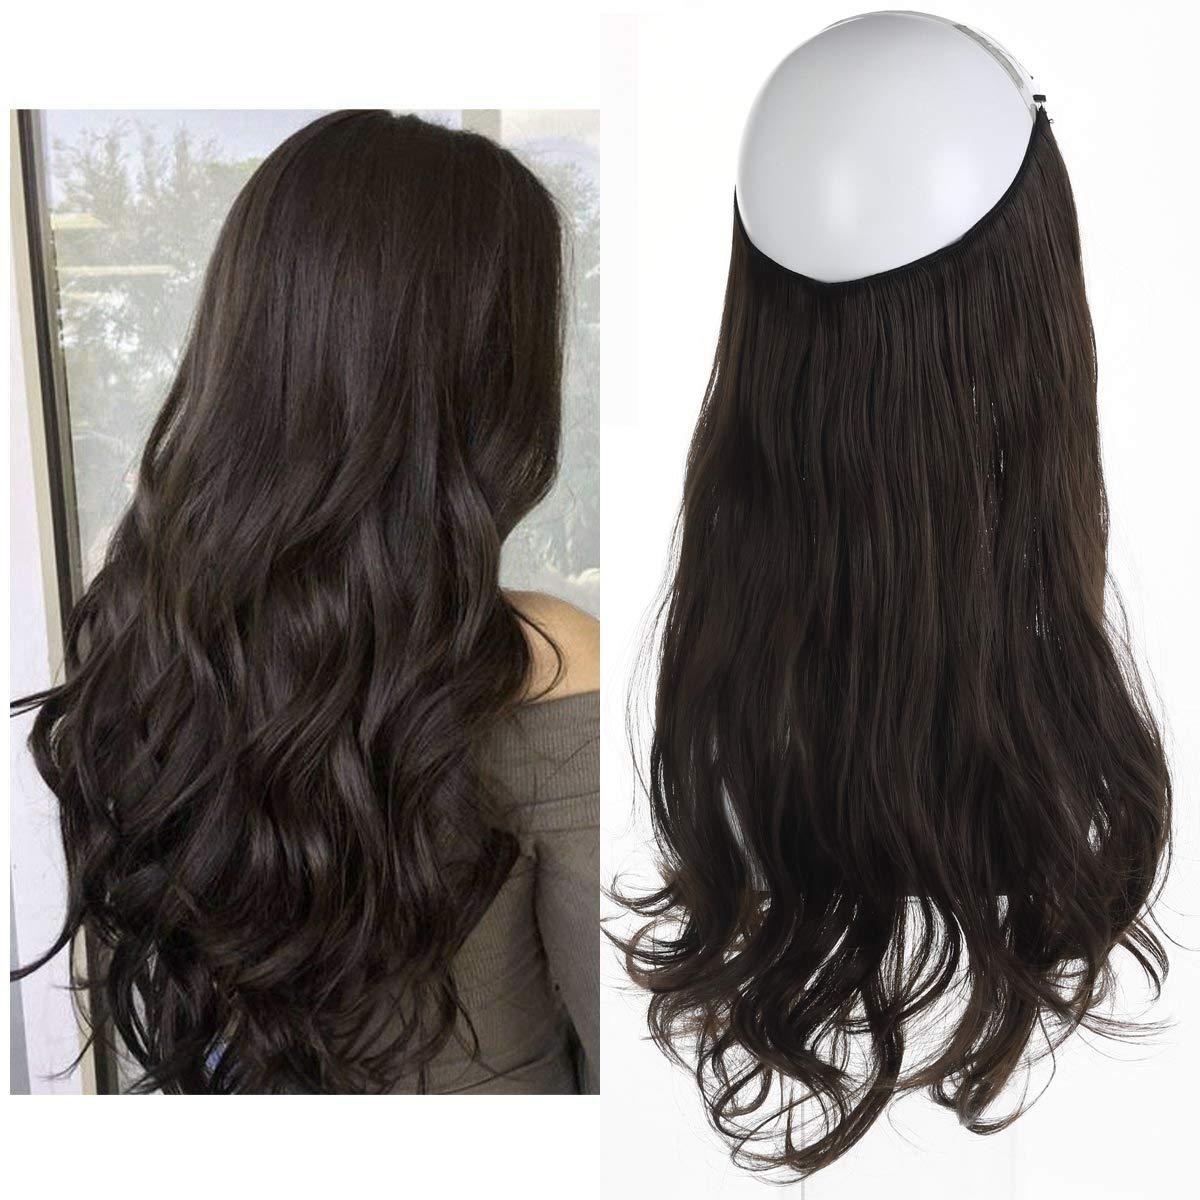 Dark Brown Hair Extension Halo Hairpiece Long 18